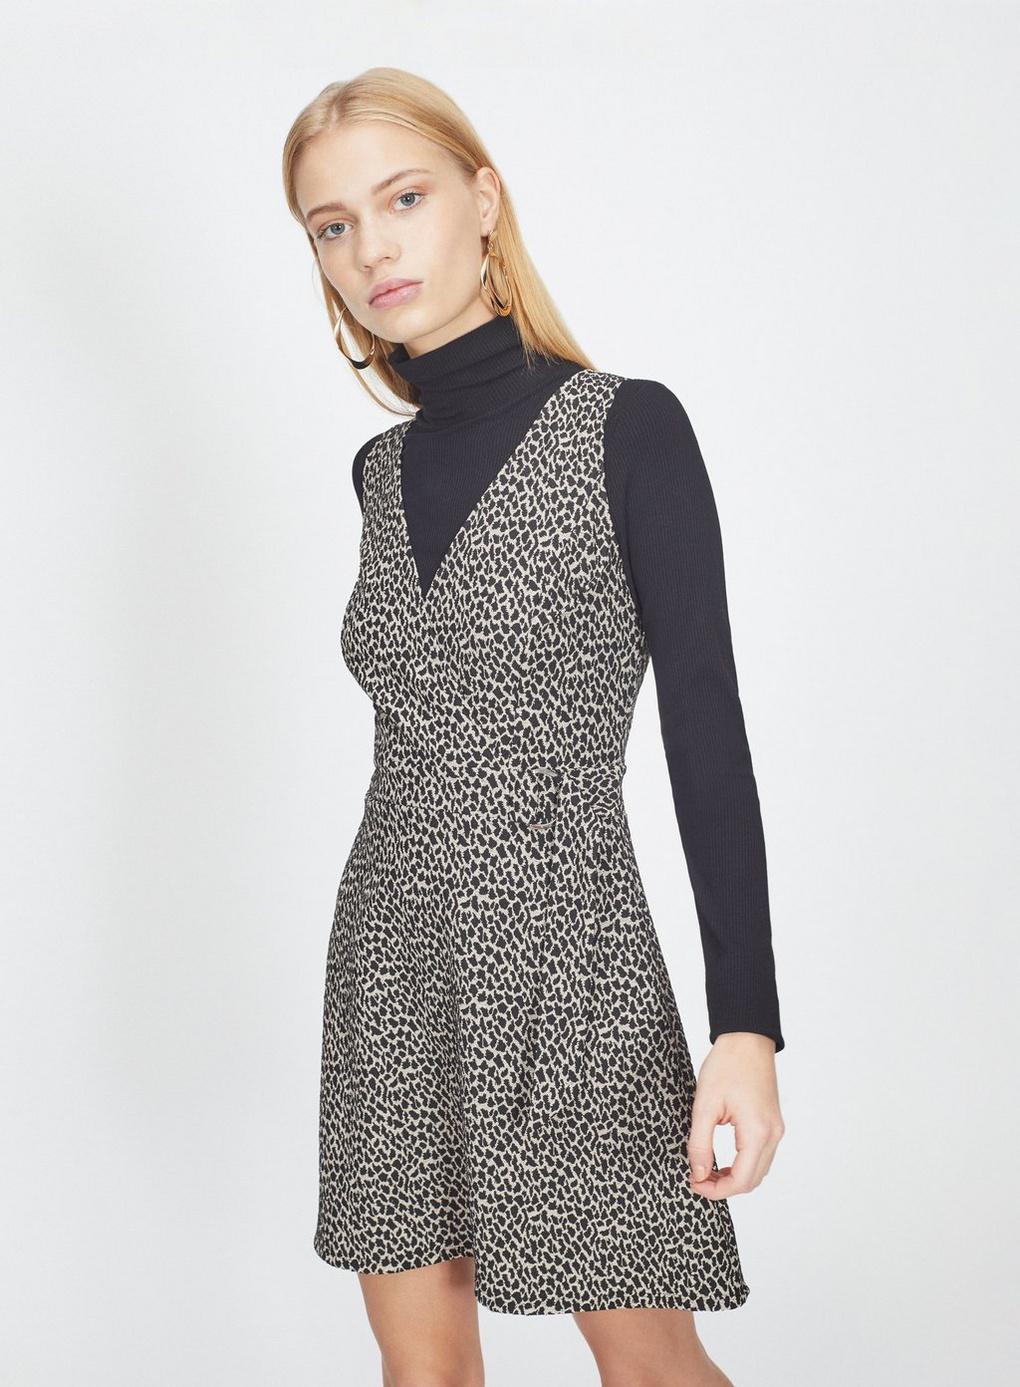 082c90d604 Miss Selfridge. Women s Brown Animal Print Jacquard D-ring Pinafore Dress